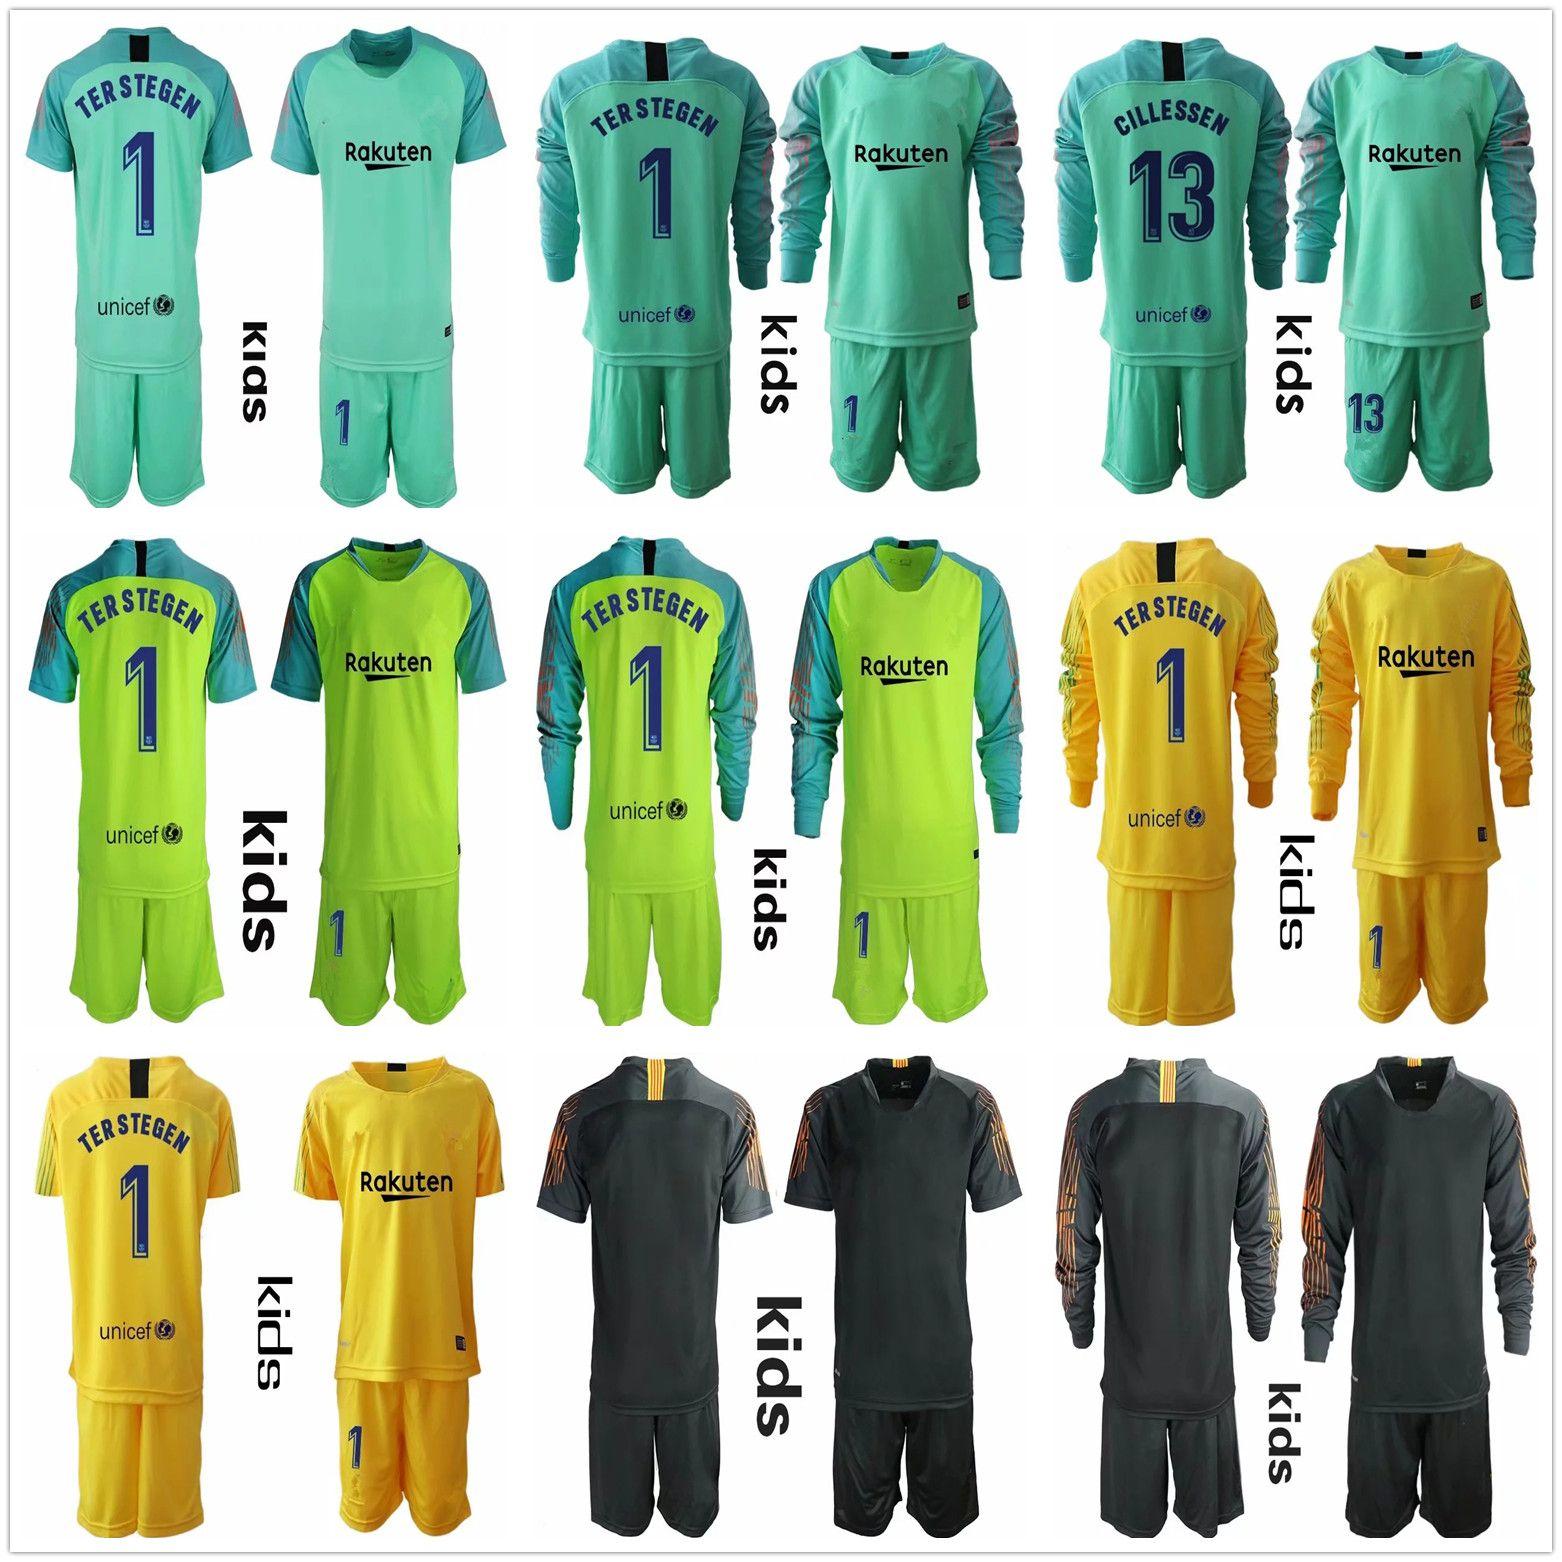 b39858158 2019 2018 2019 Youth Long Ter Stegen Goalkeeper Jerseys Kids Kit Soccer  Sets  1 Marc Andre Ter Stegen Kid Boy Goalkeeper Jersey Children Uniform  From ...